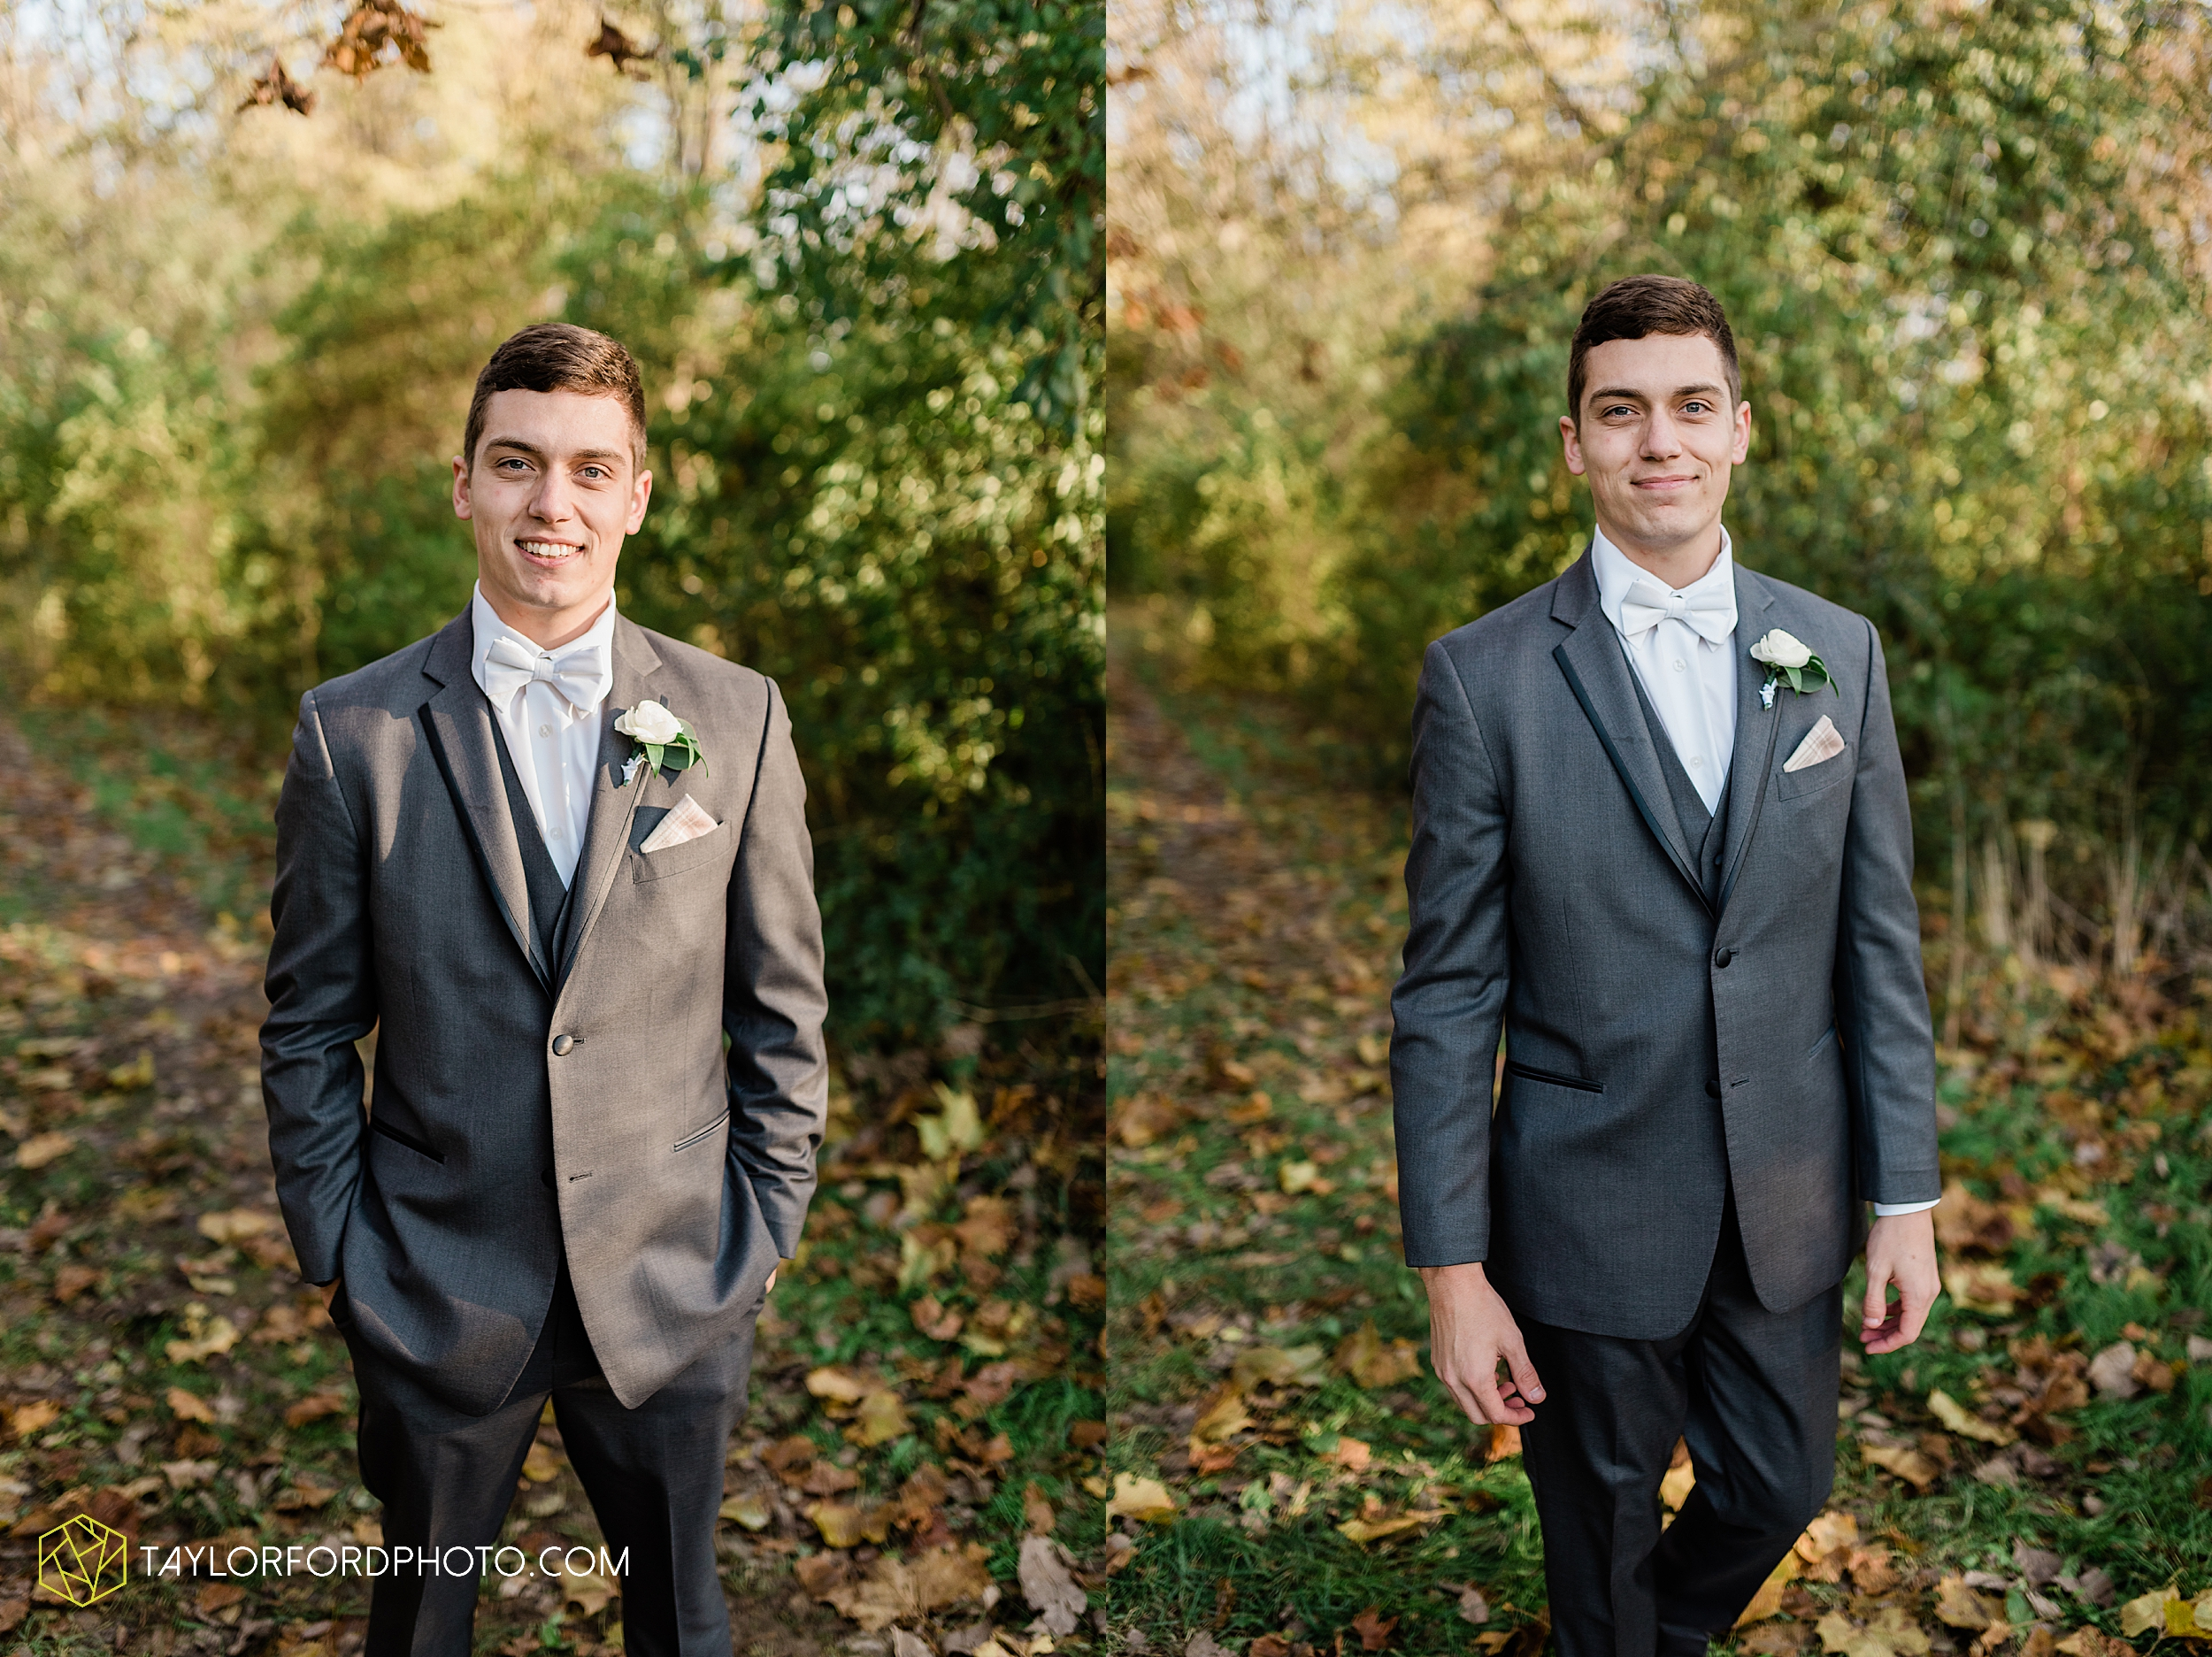 marissa-nicole-nick-daeger-orrmont-estate-farm-wedding-piqua-dayton-troy-ohio-fall-photographer-taylor-ford-photography_1550.jpg